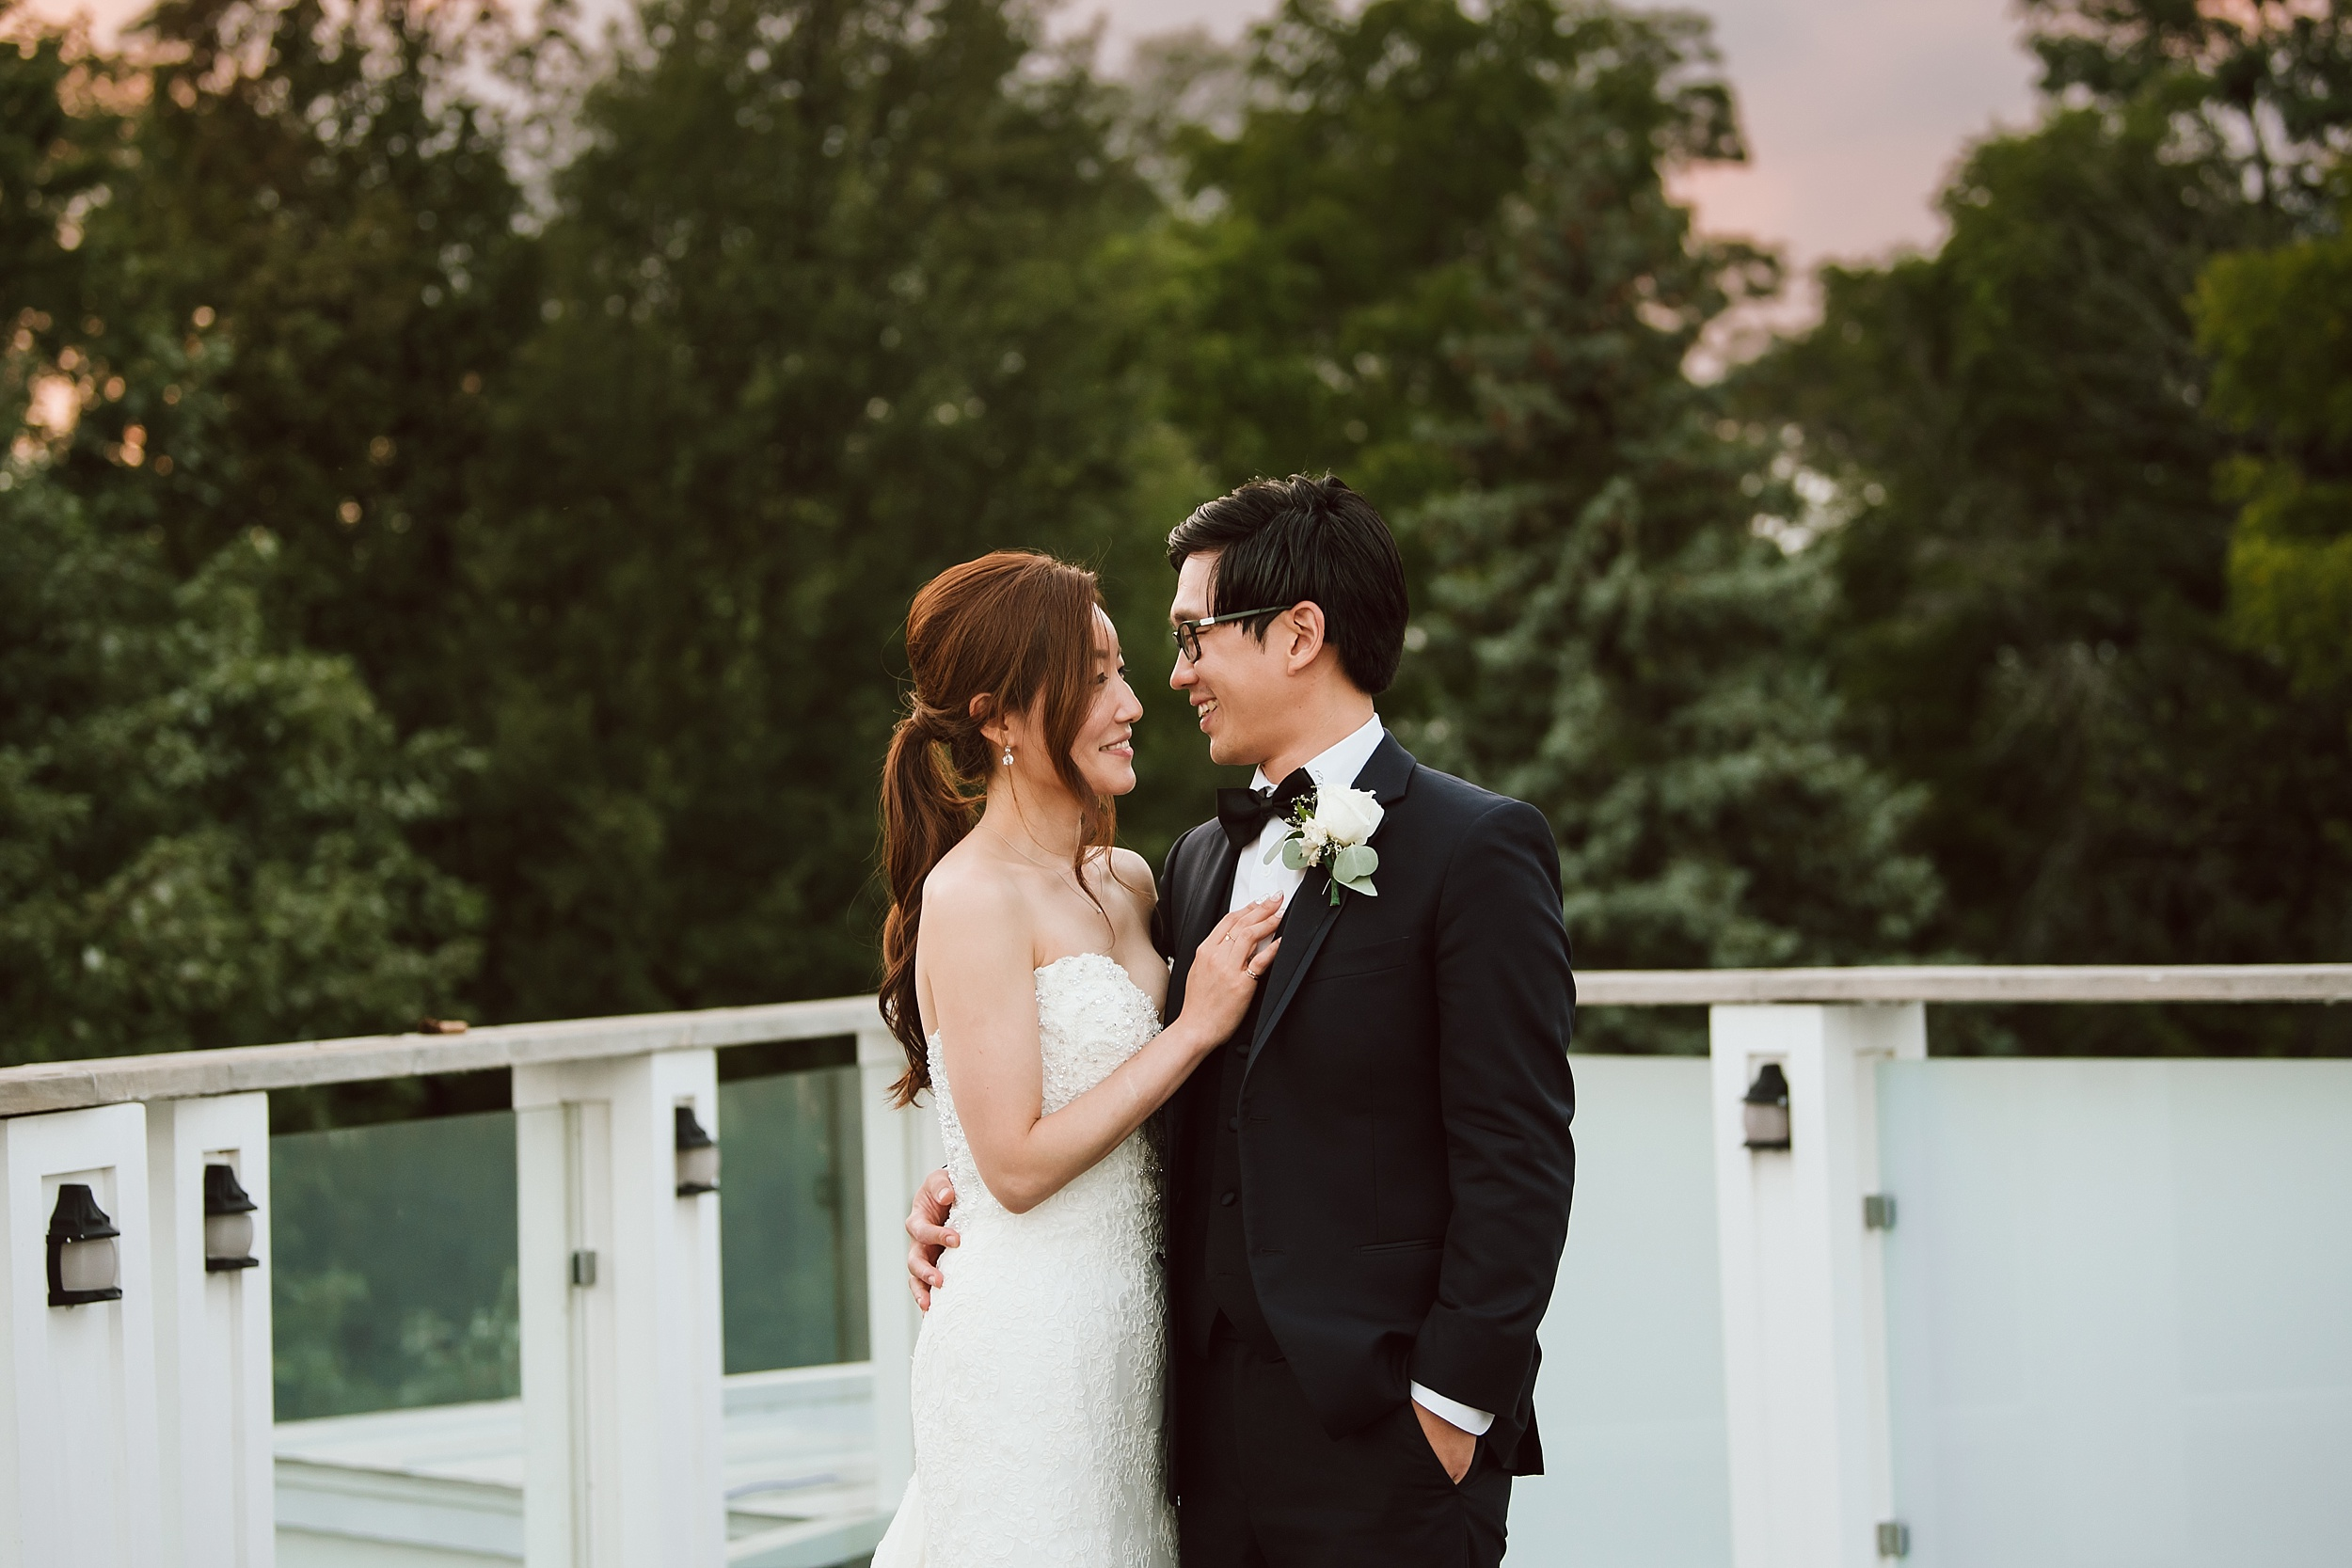 Doctors_House_Kleinburg_Wedding_Toronto_Photographer_0050.jpg